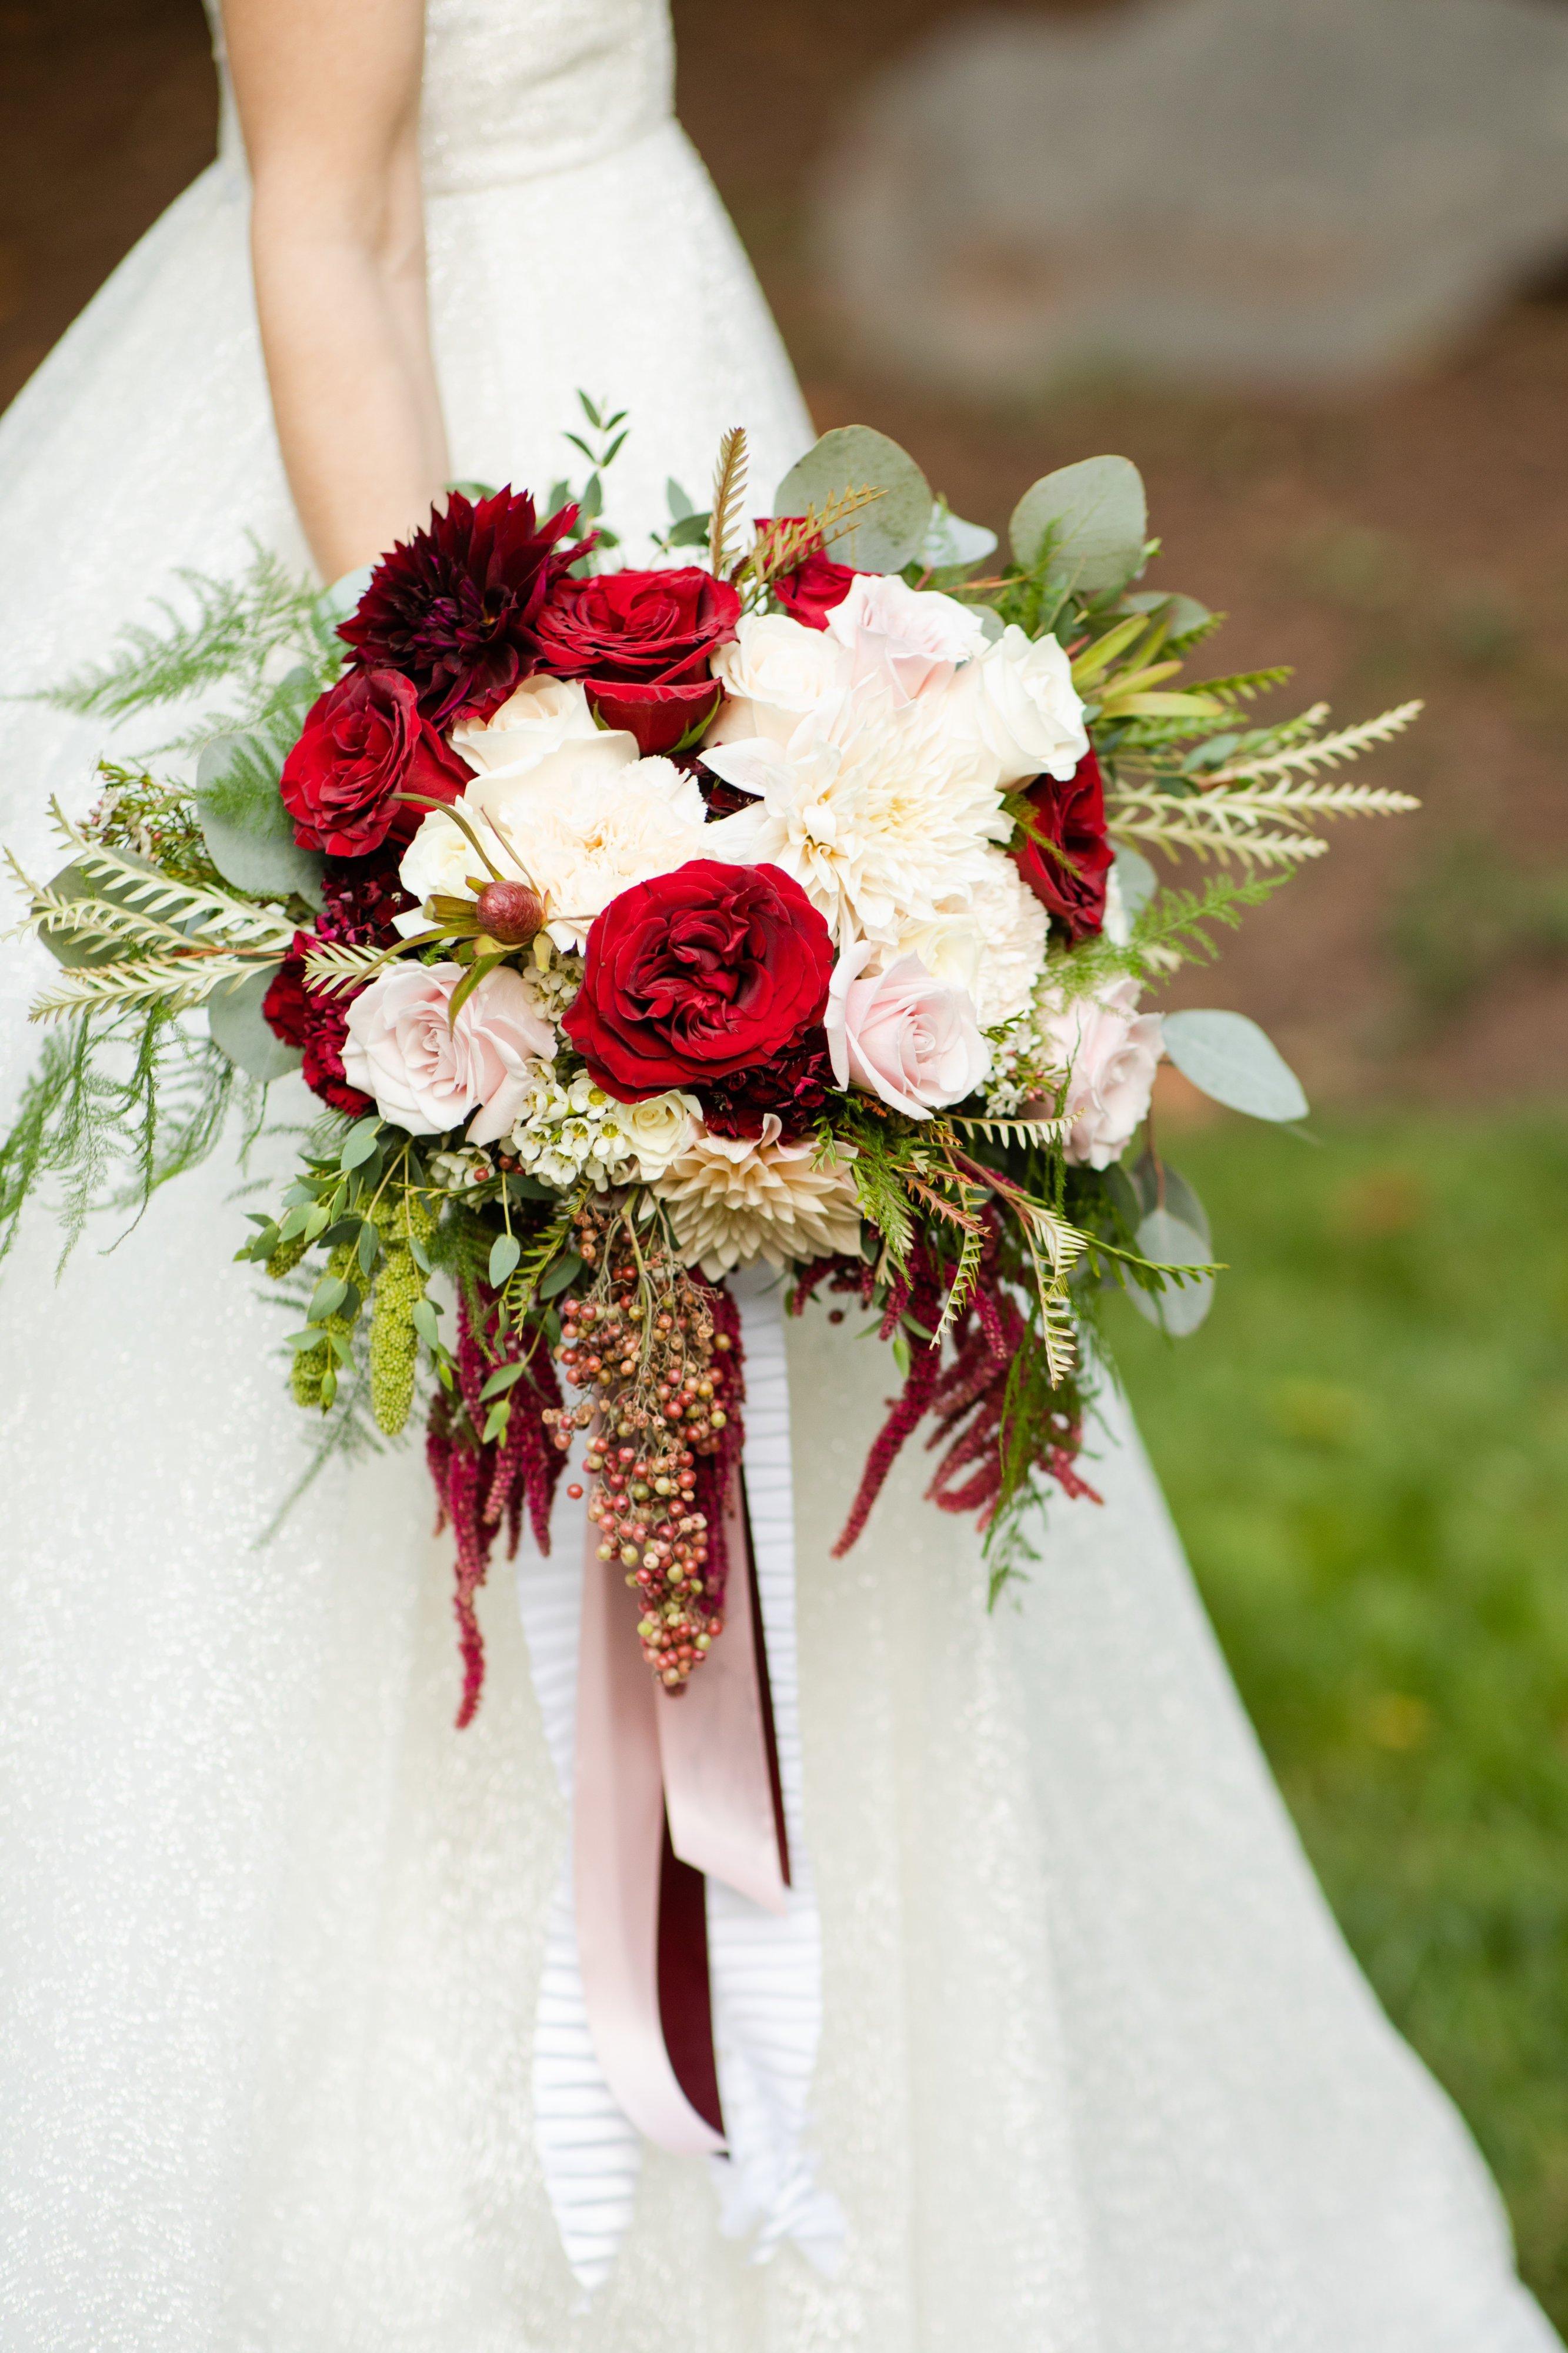 StefanieKamermanPhotography-MelanieandBenjamin-Wedding-Bethesda,MD-2019-10-12-142